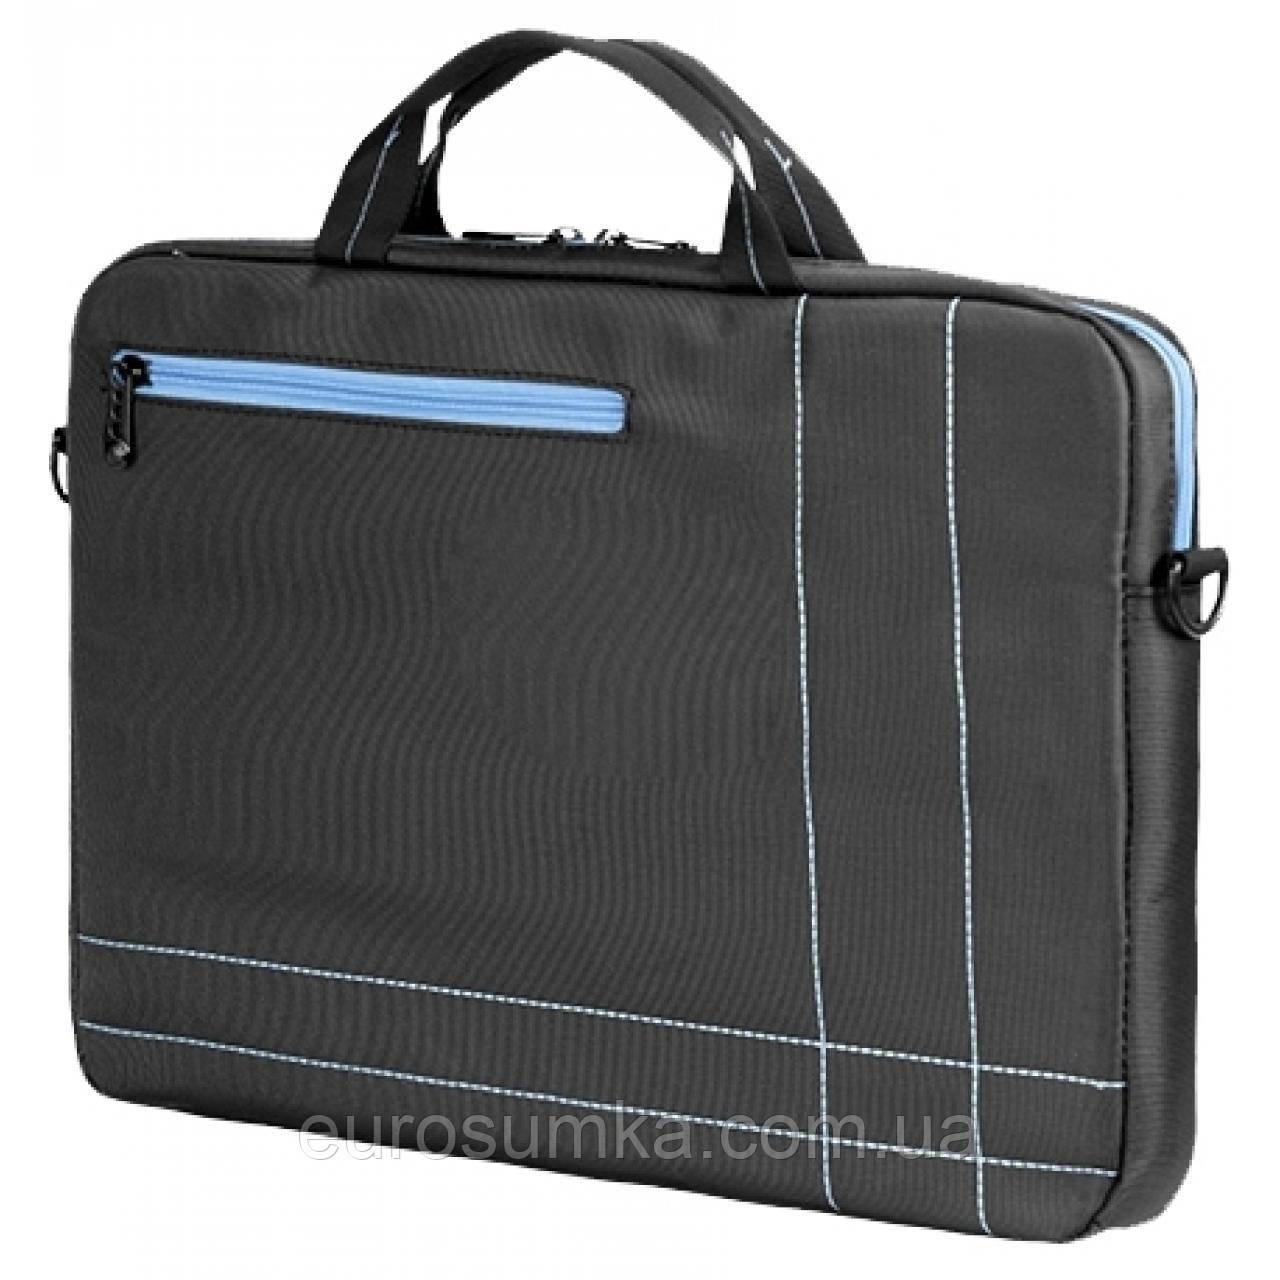 Конференц сумка с логотипом от 50 шт.